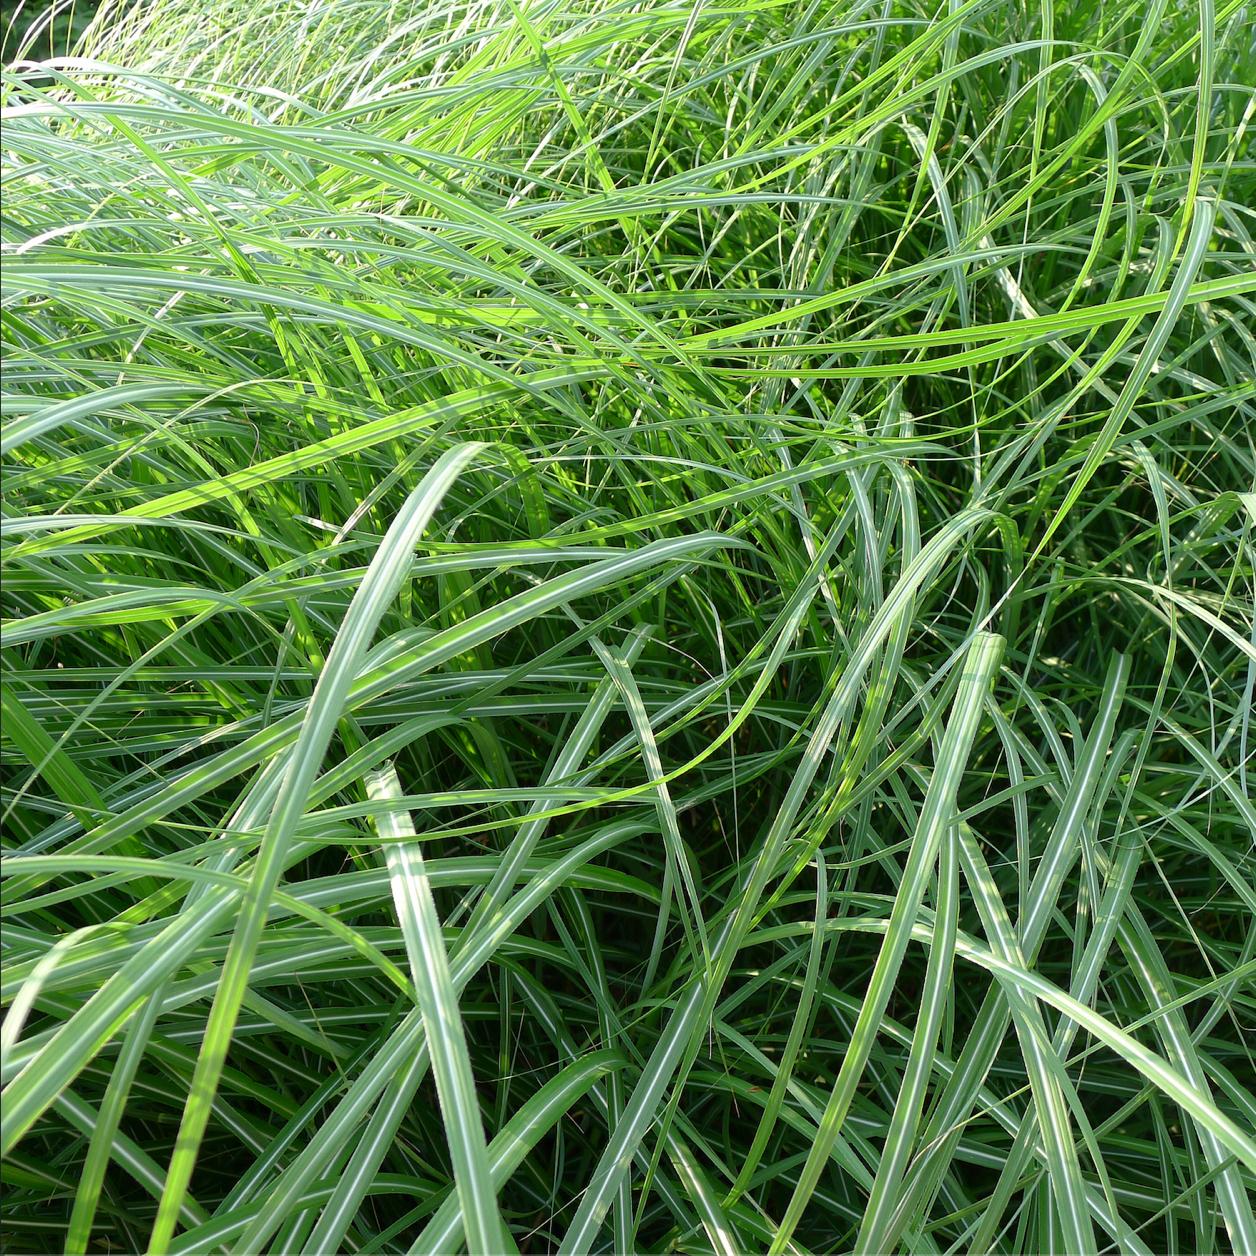 Thin, long blades of grass